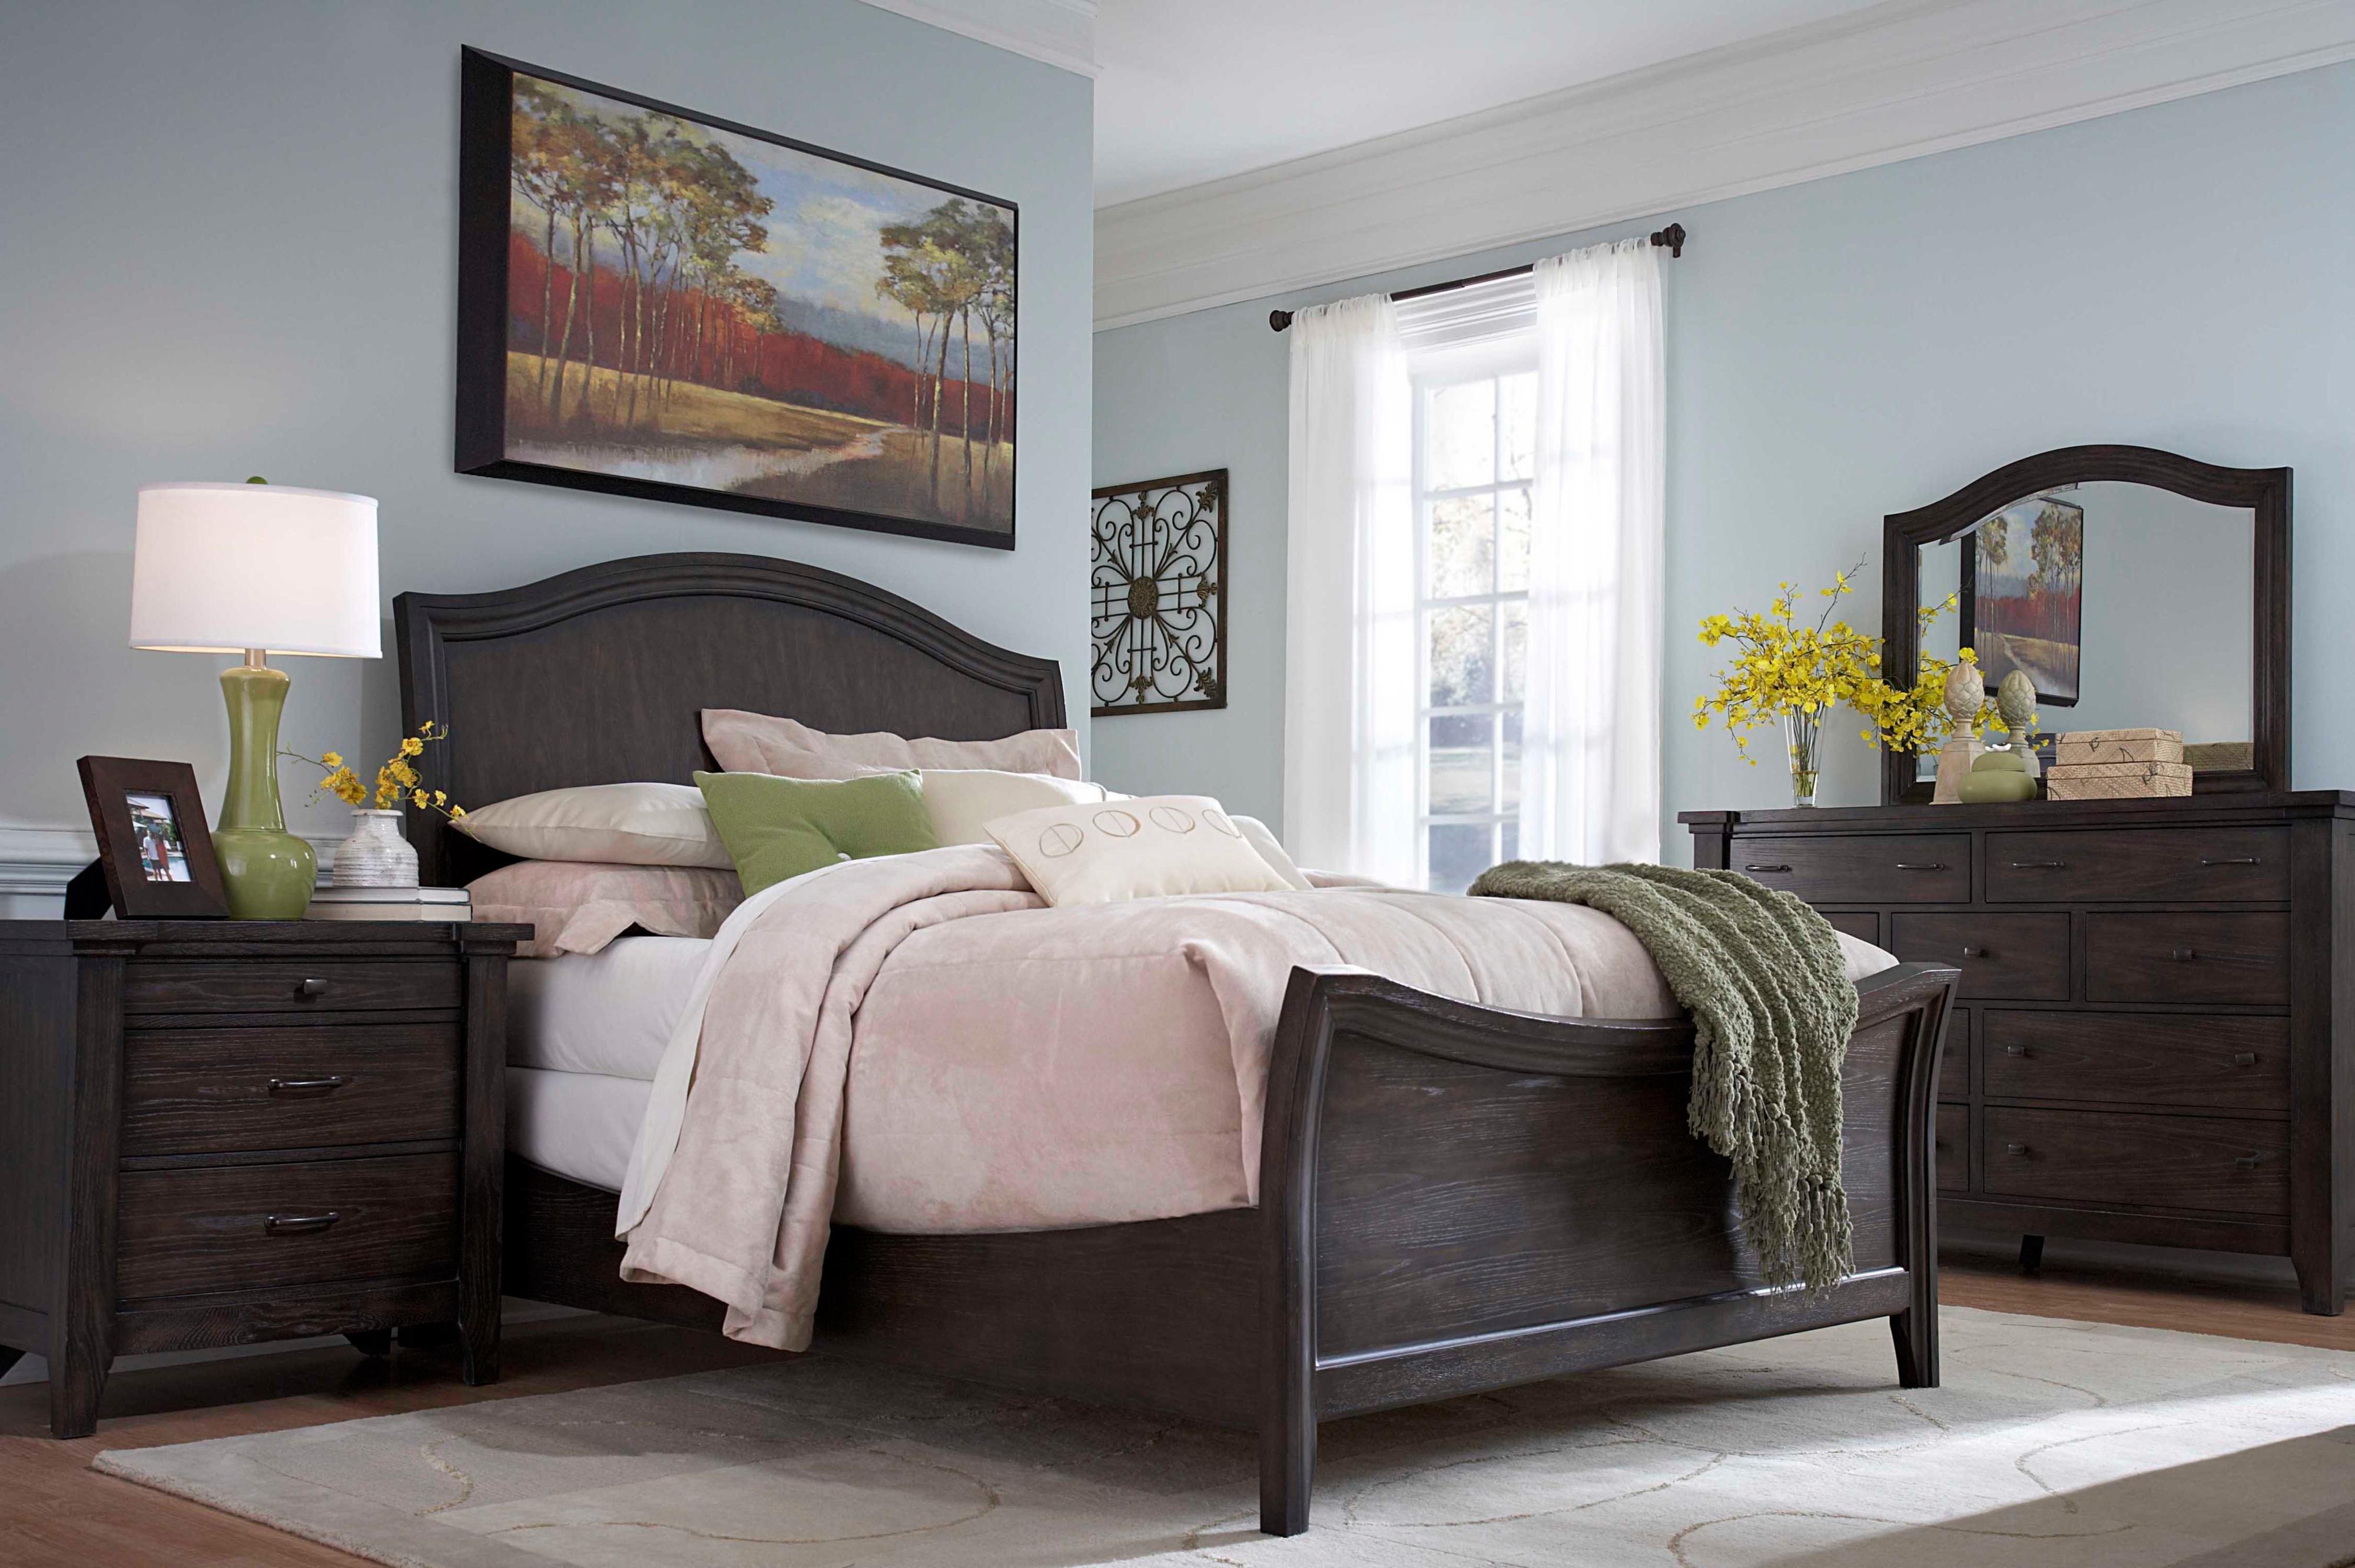 Broyhill Furniture Attic Retreat Queen Bedroom Group ...